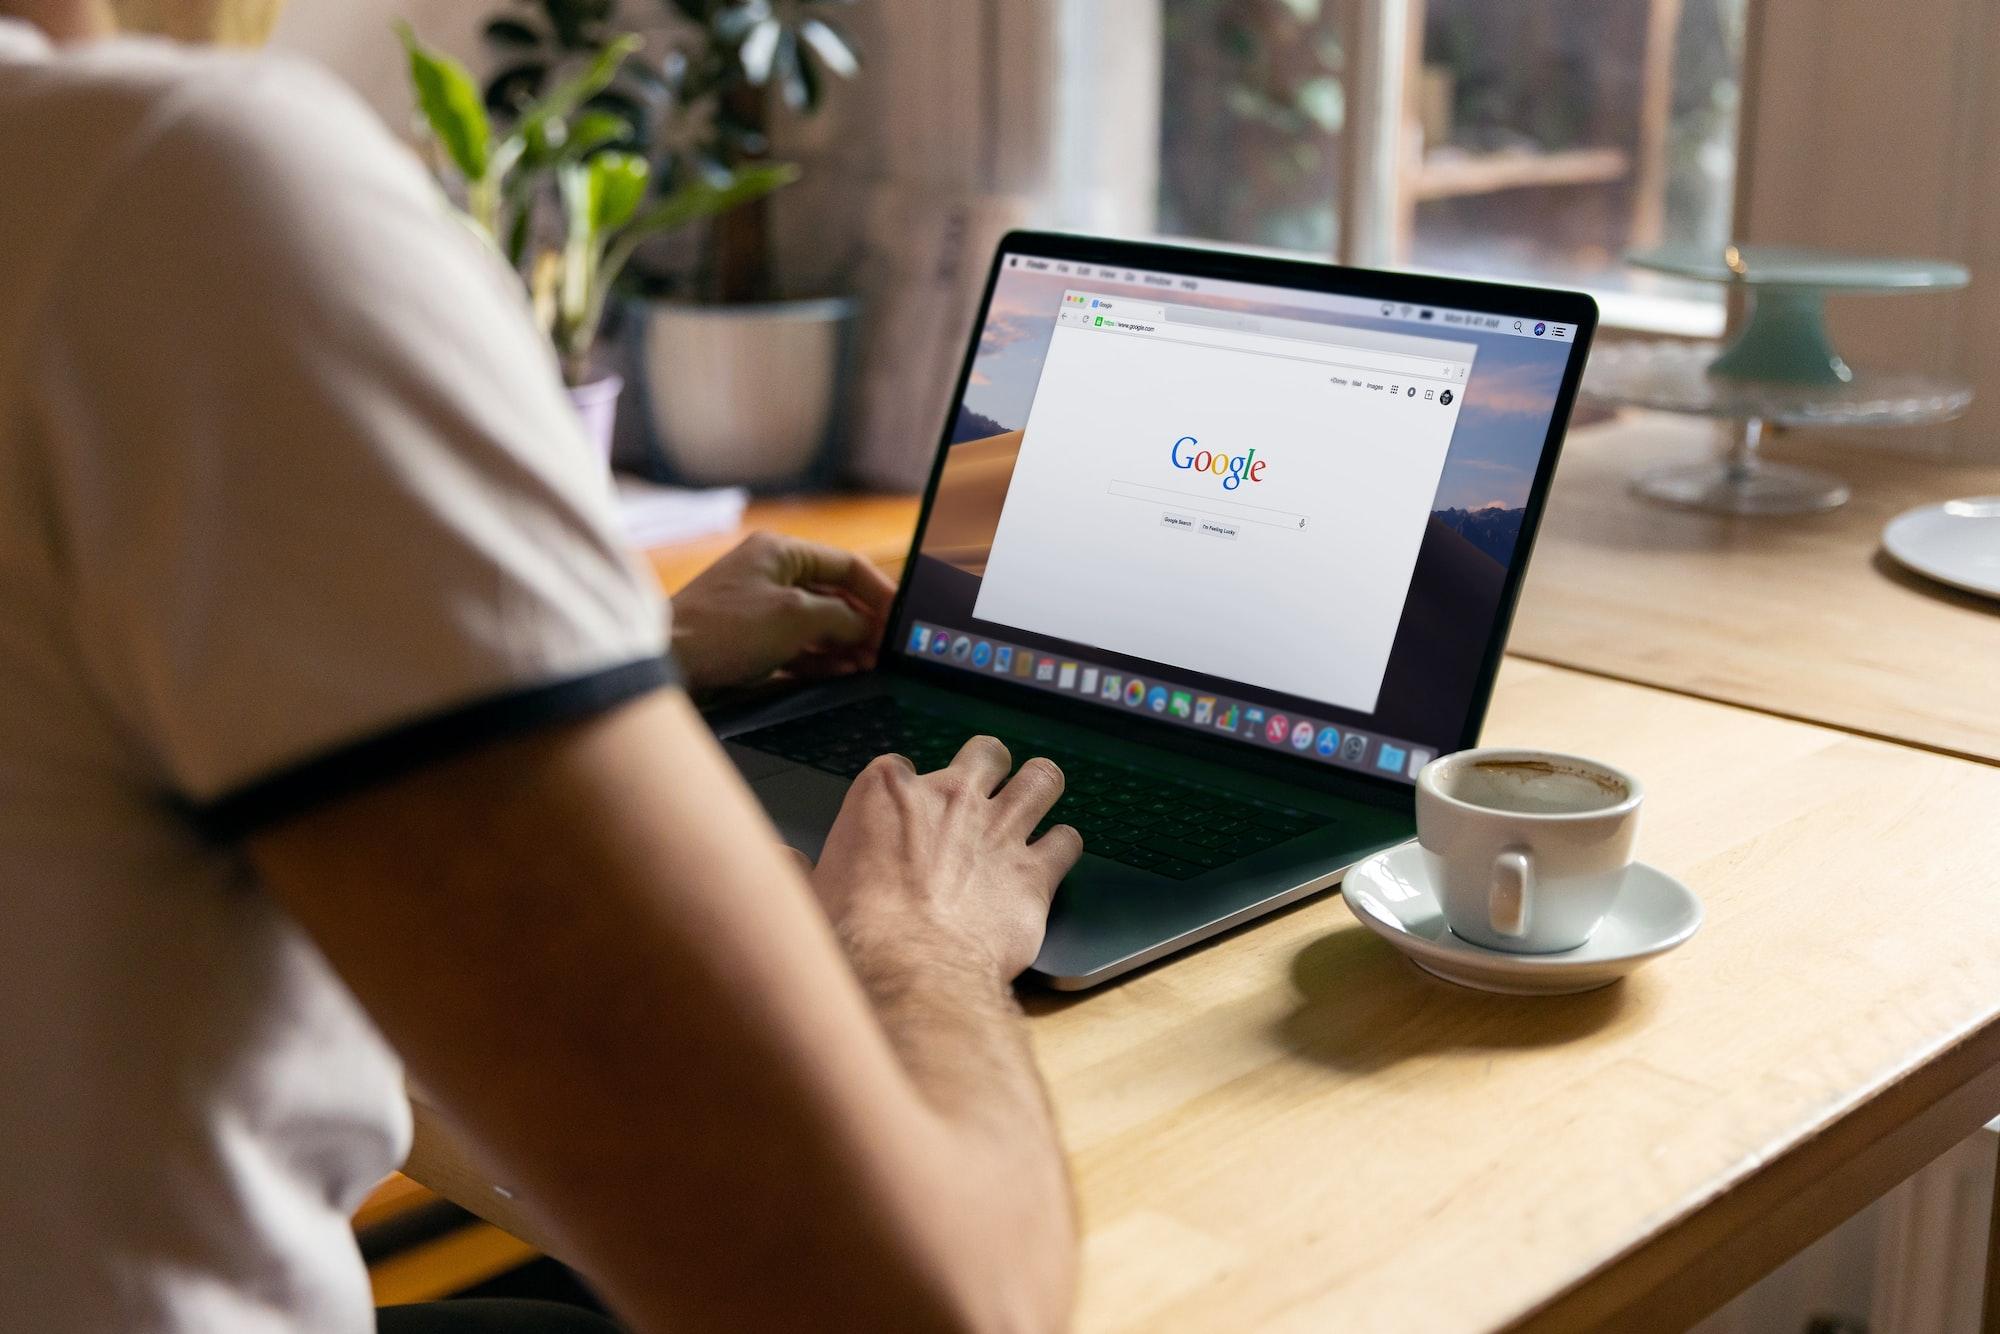 Productivity Ping #10 - Google Chrome Power Tip